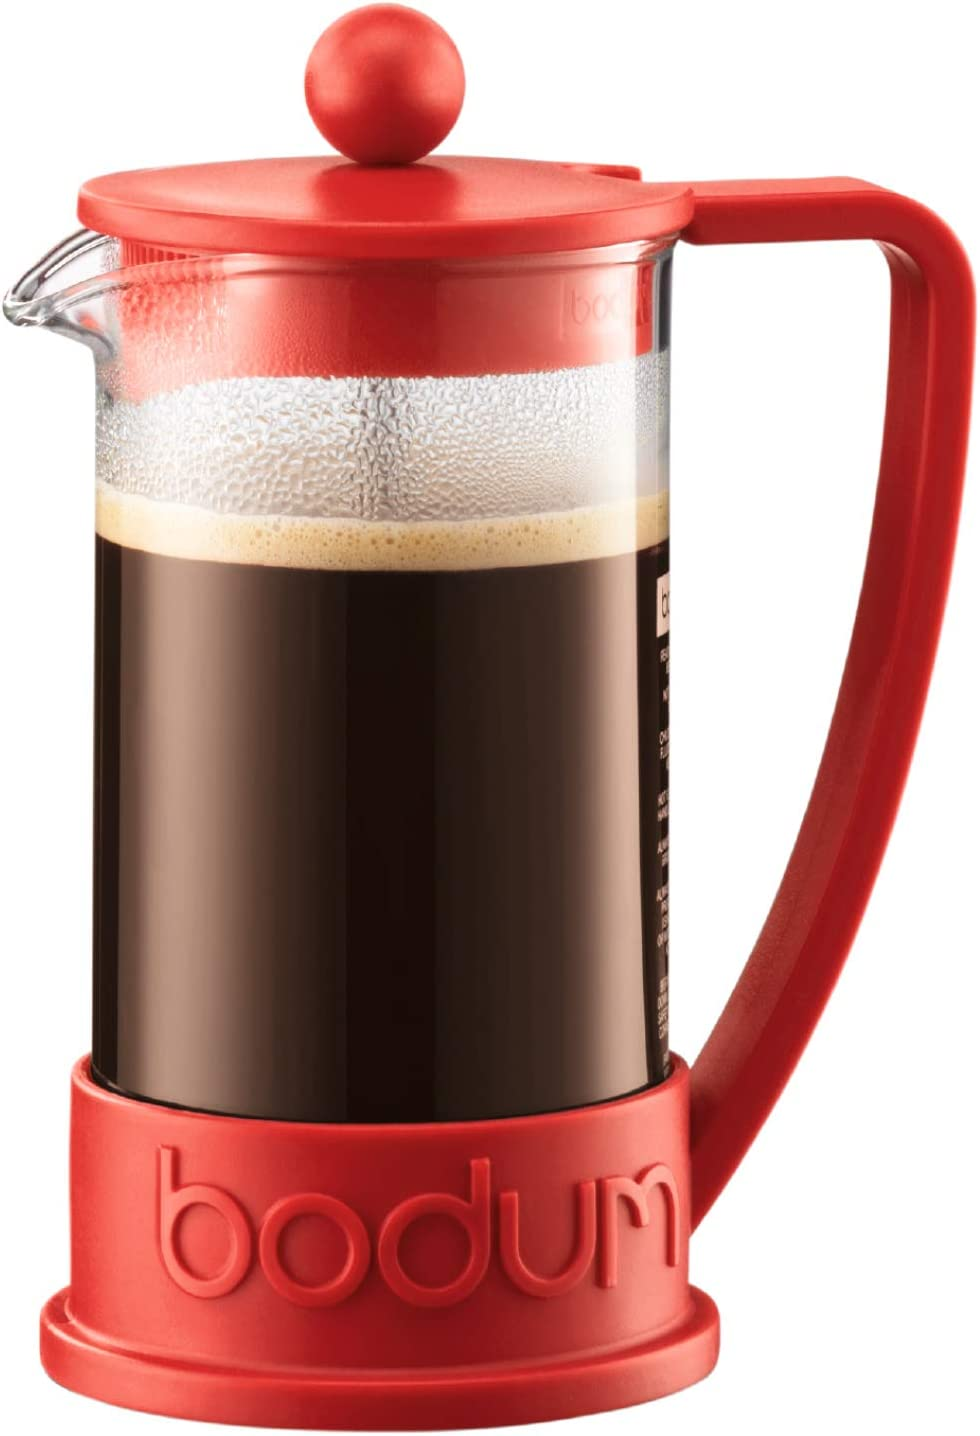 Bodum 10948-294 Cafetera émbolo, 0.35 Liters, Rojo: Amazon.es: Hogar